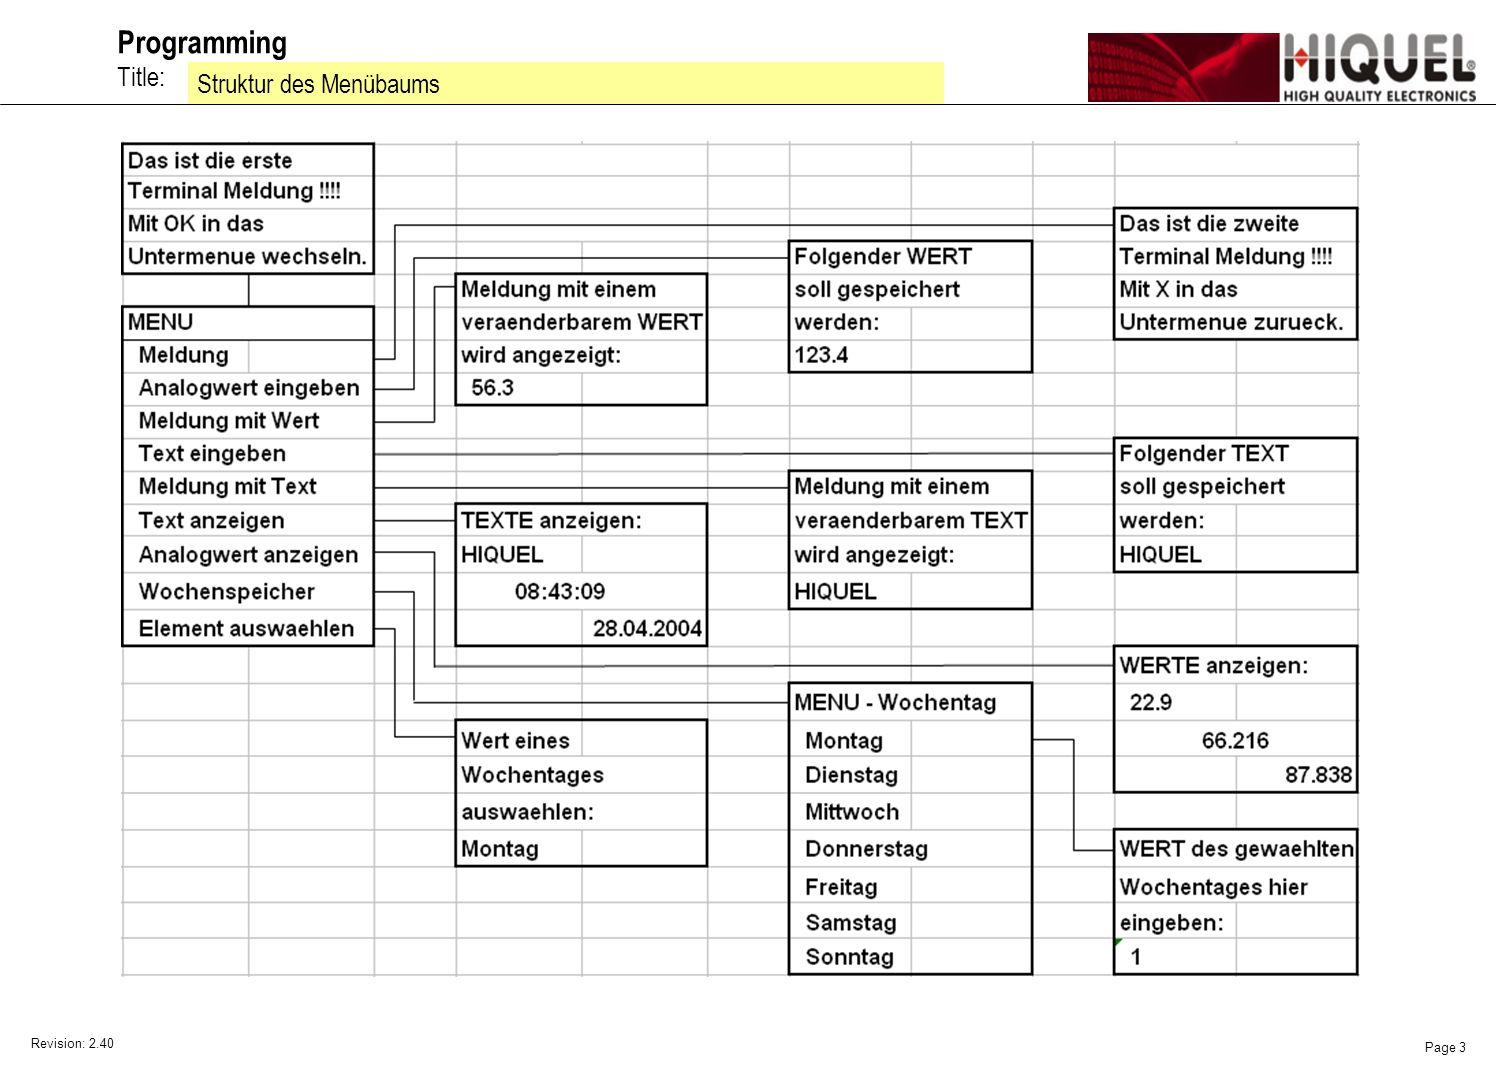 Revision: 2.40 Page 3 Title: Programming Struktur des Menübaums